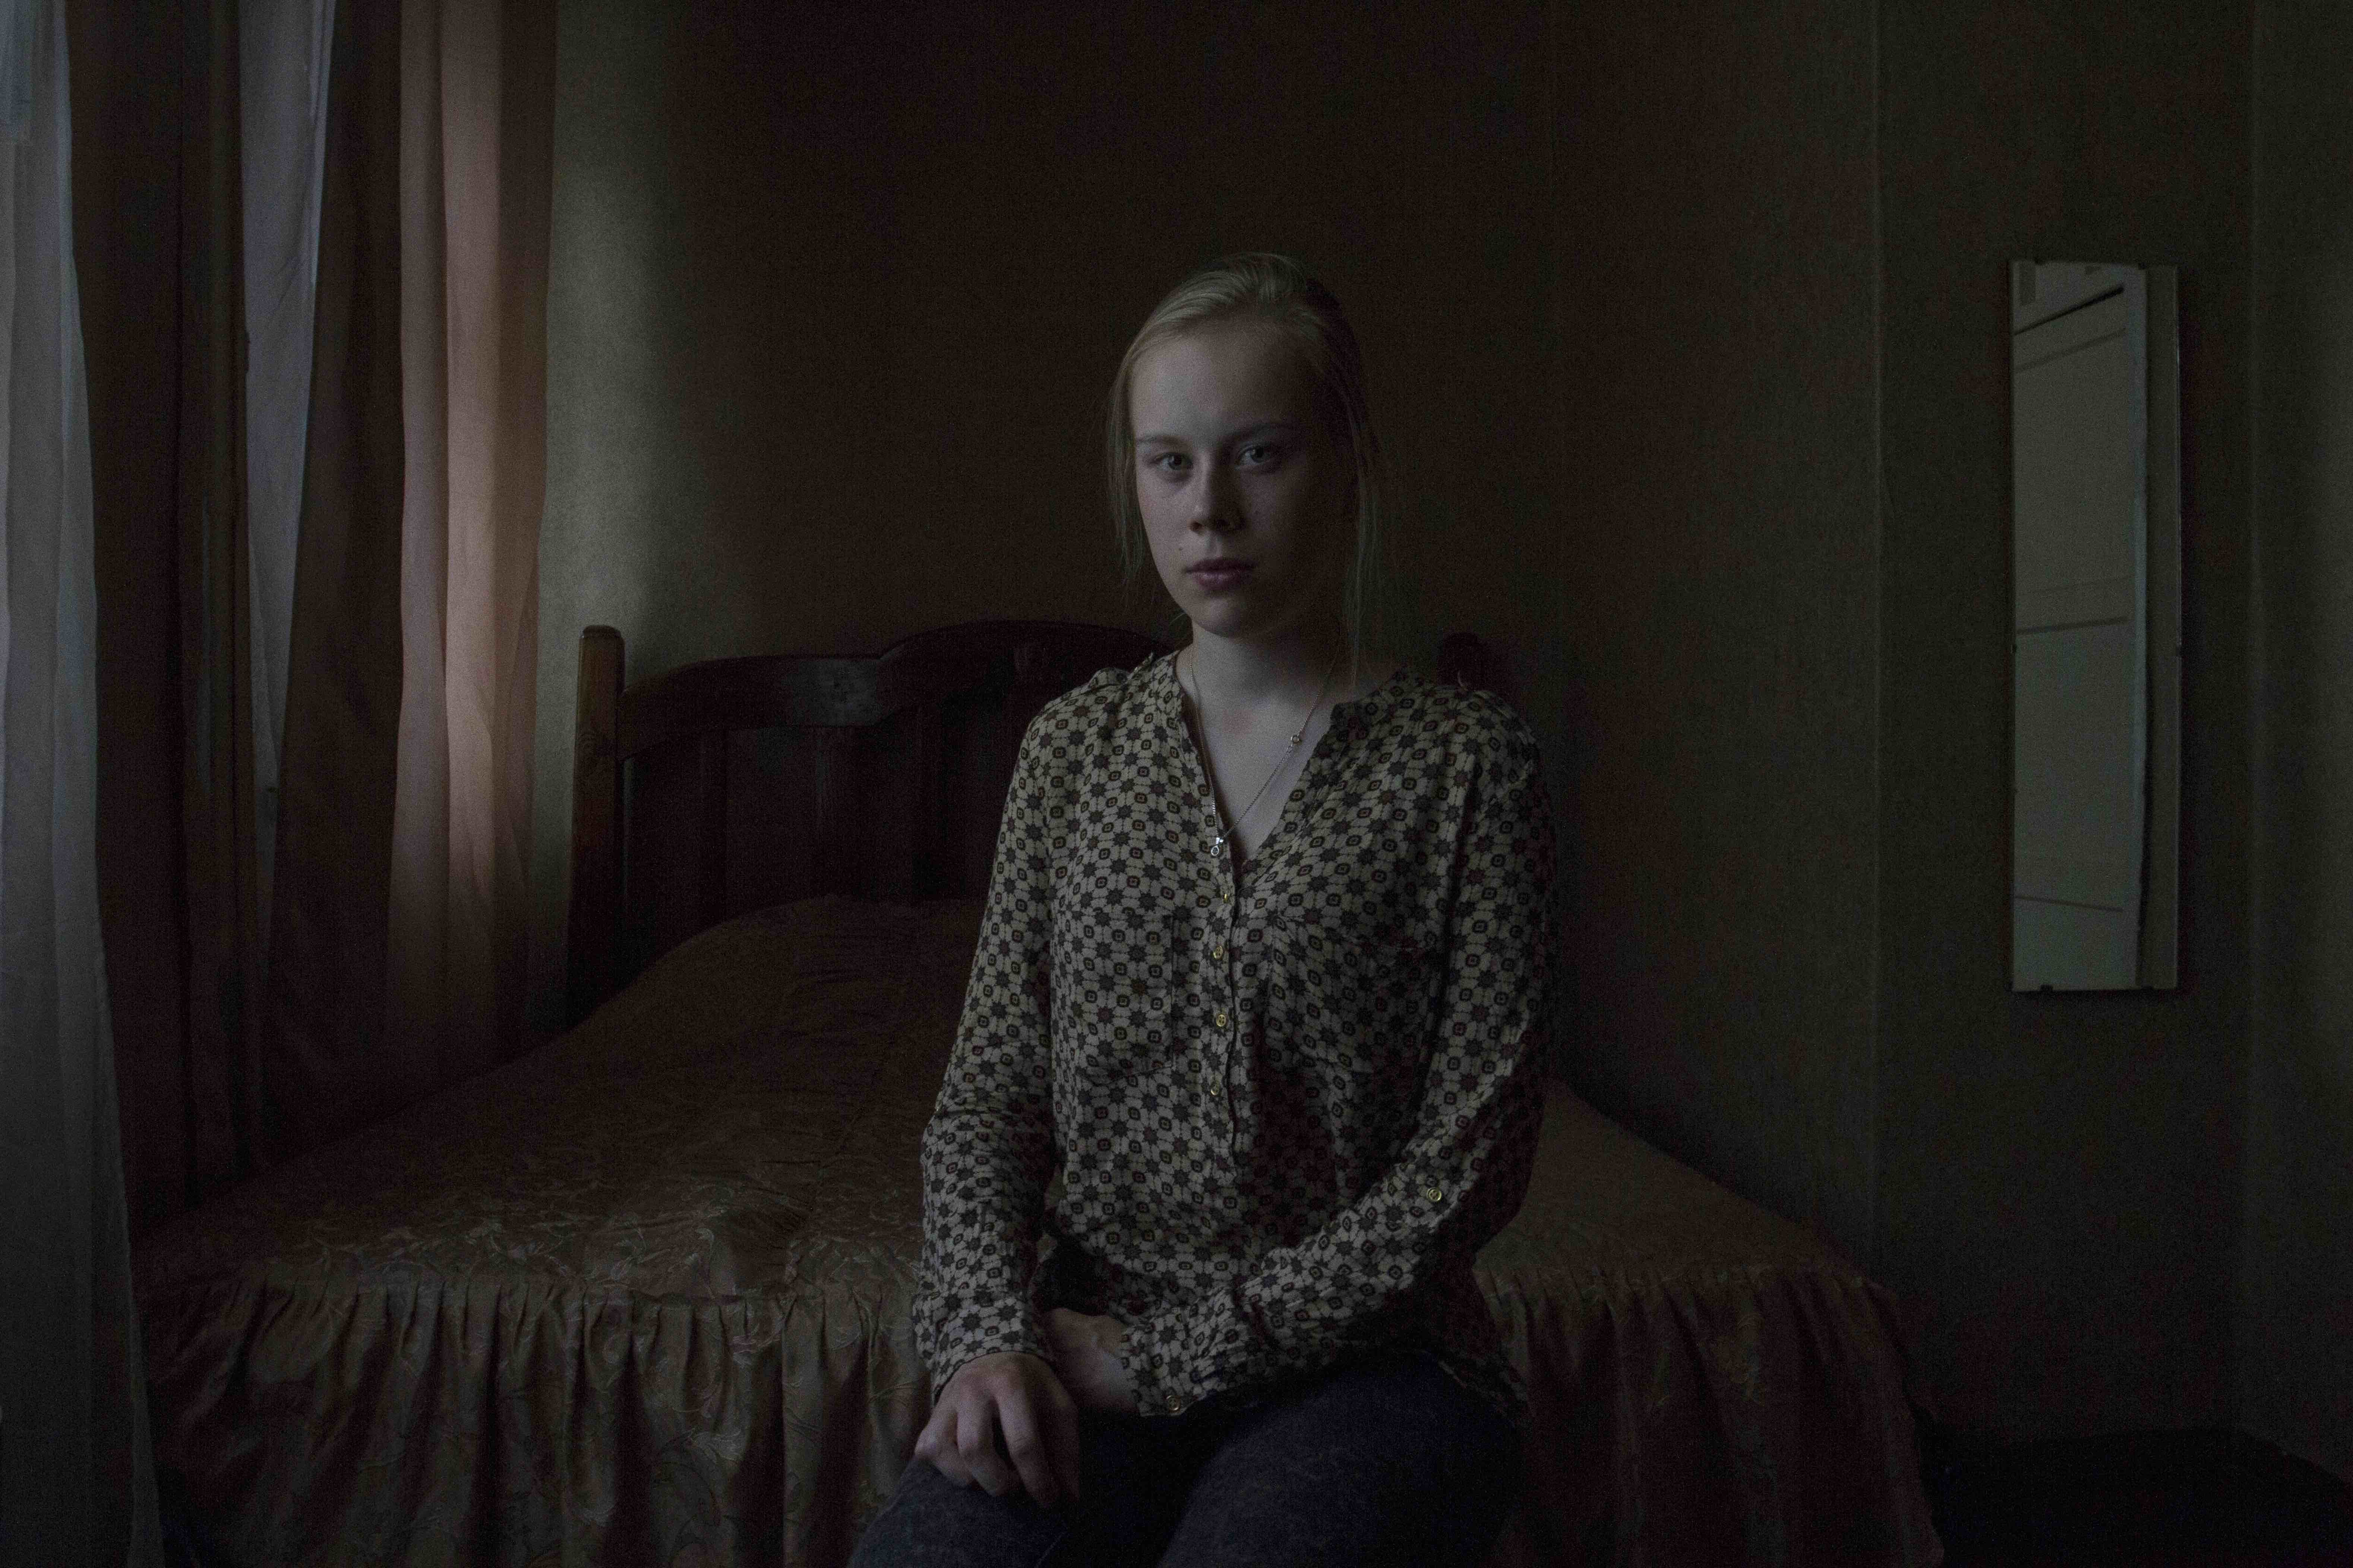 Maria, 18 years old. Ivanovo, Russia.